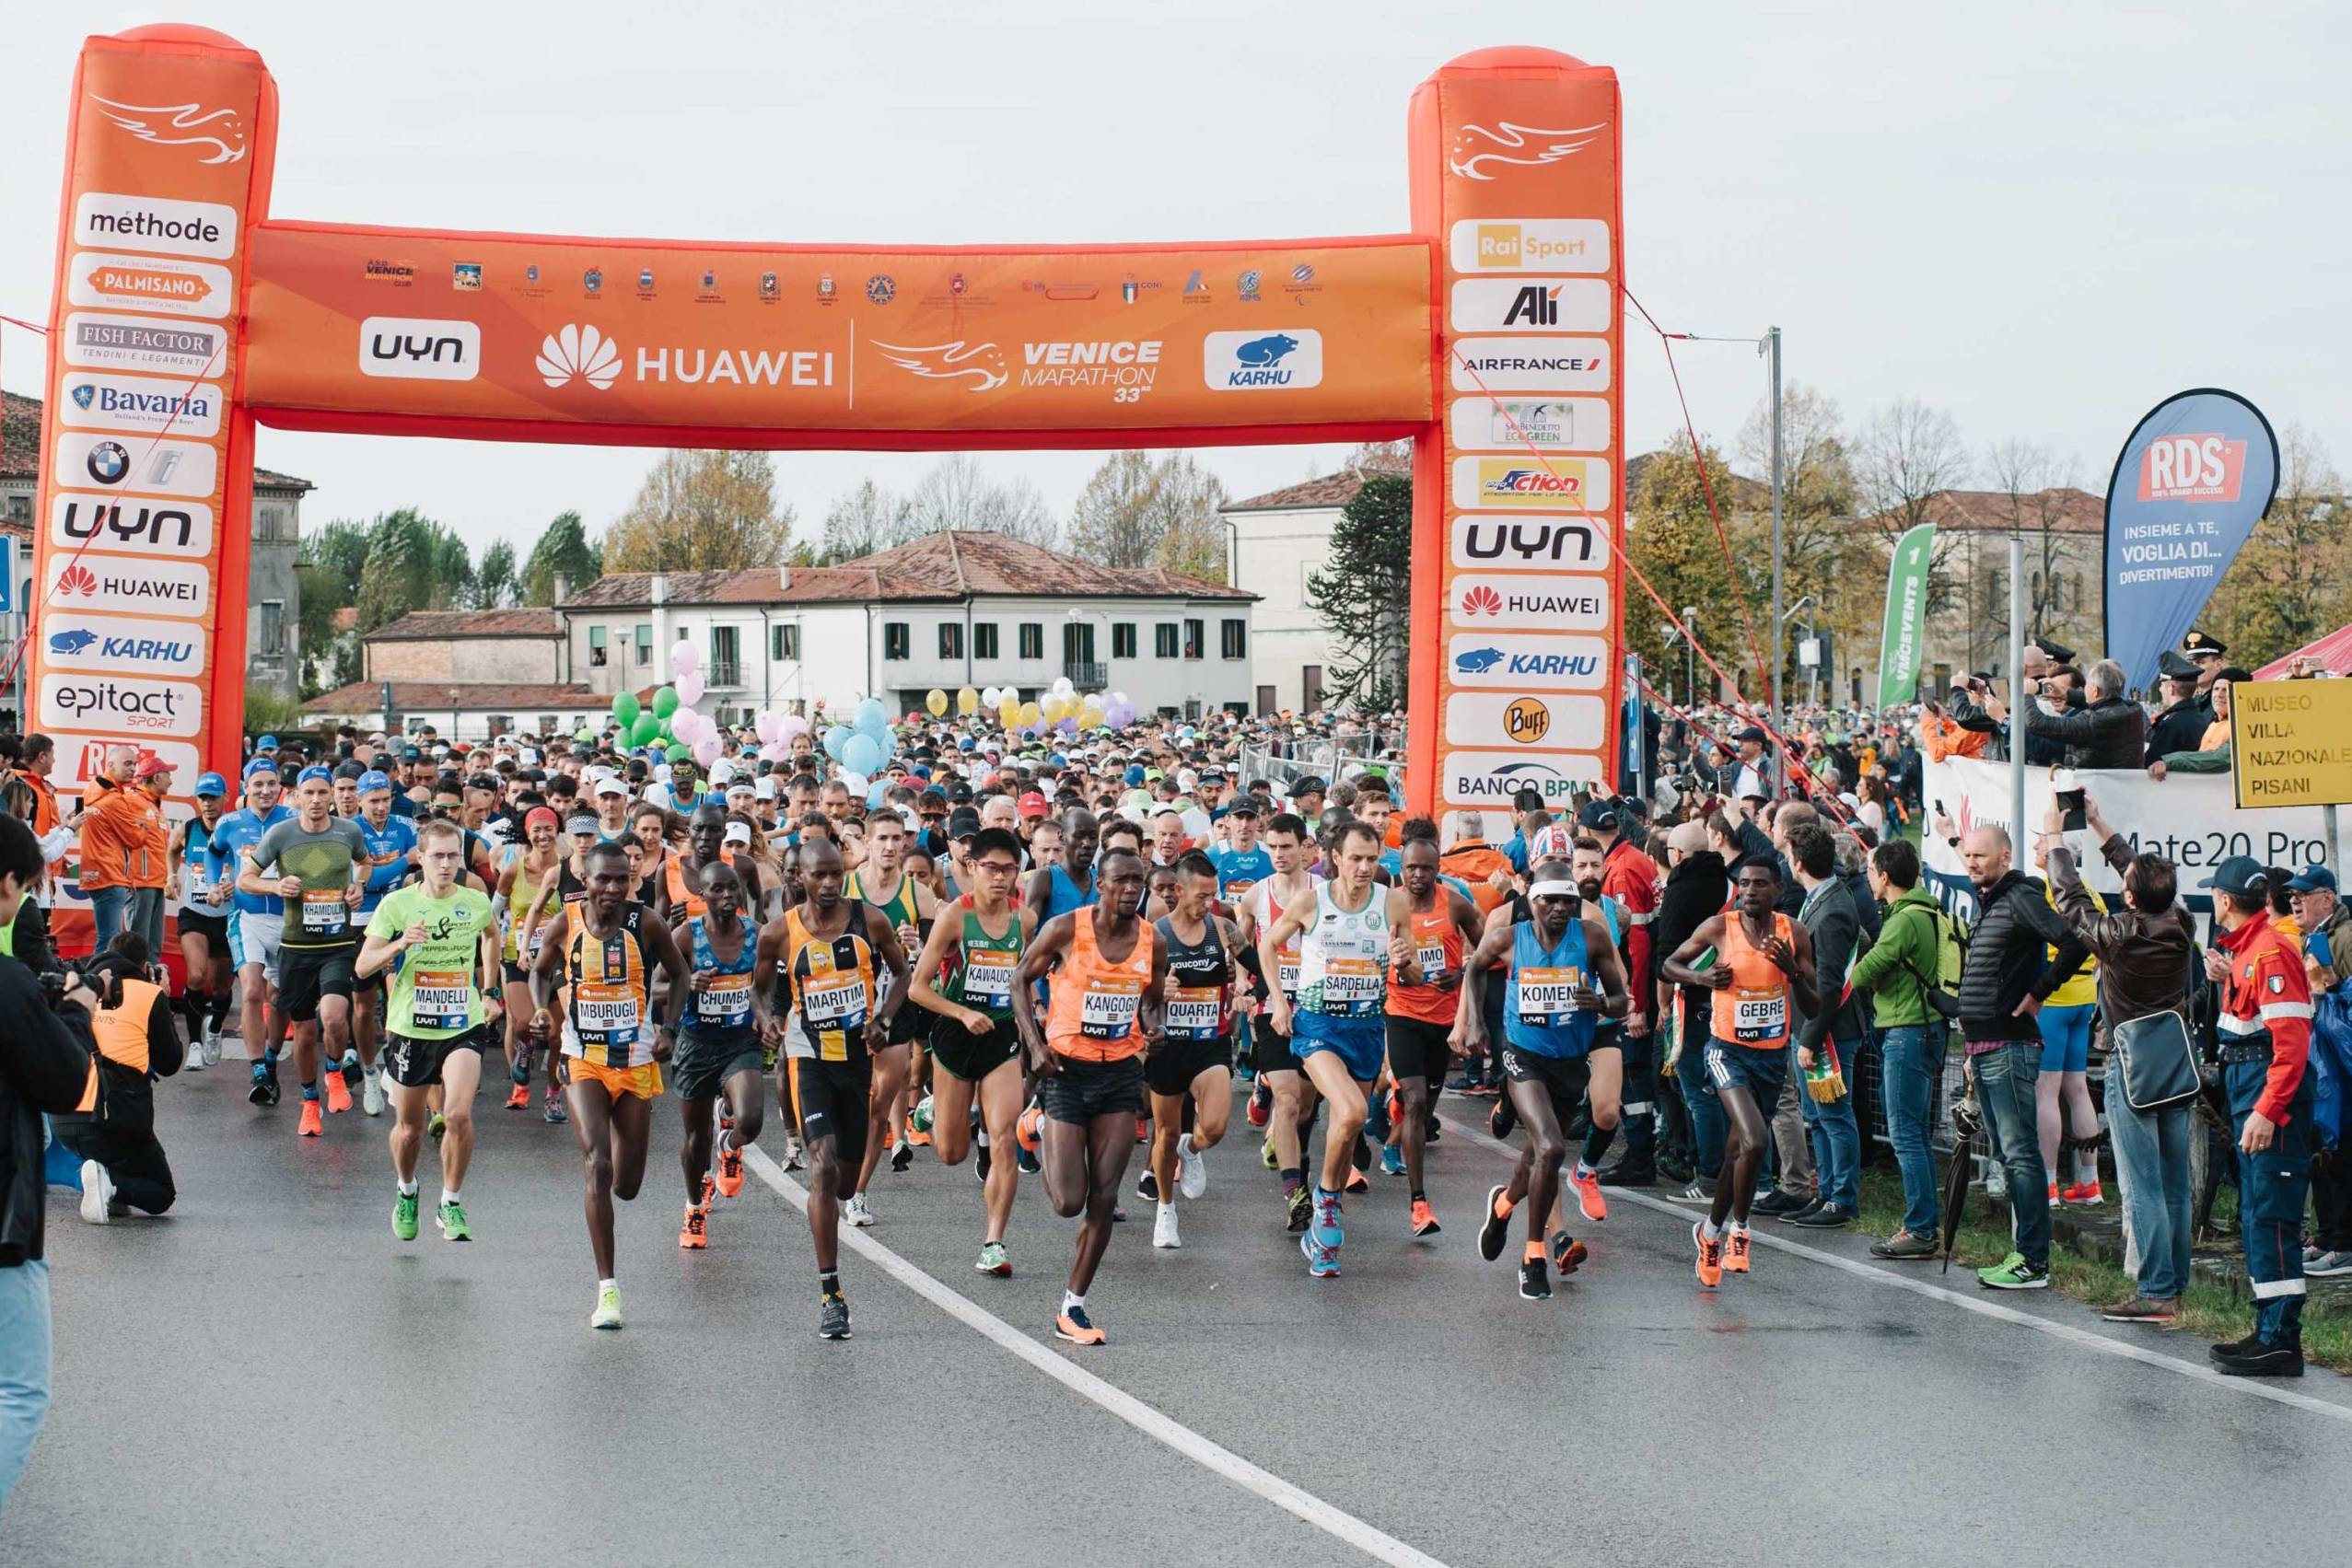 Huawei Marathons gruppo di concorrenti